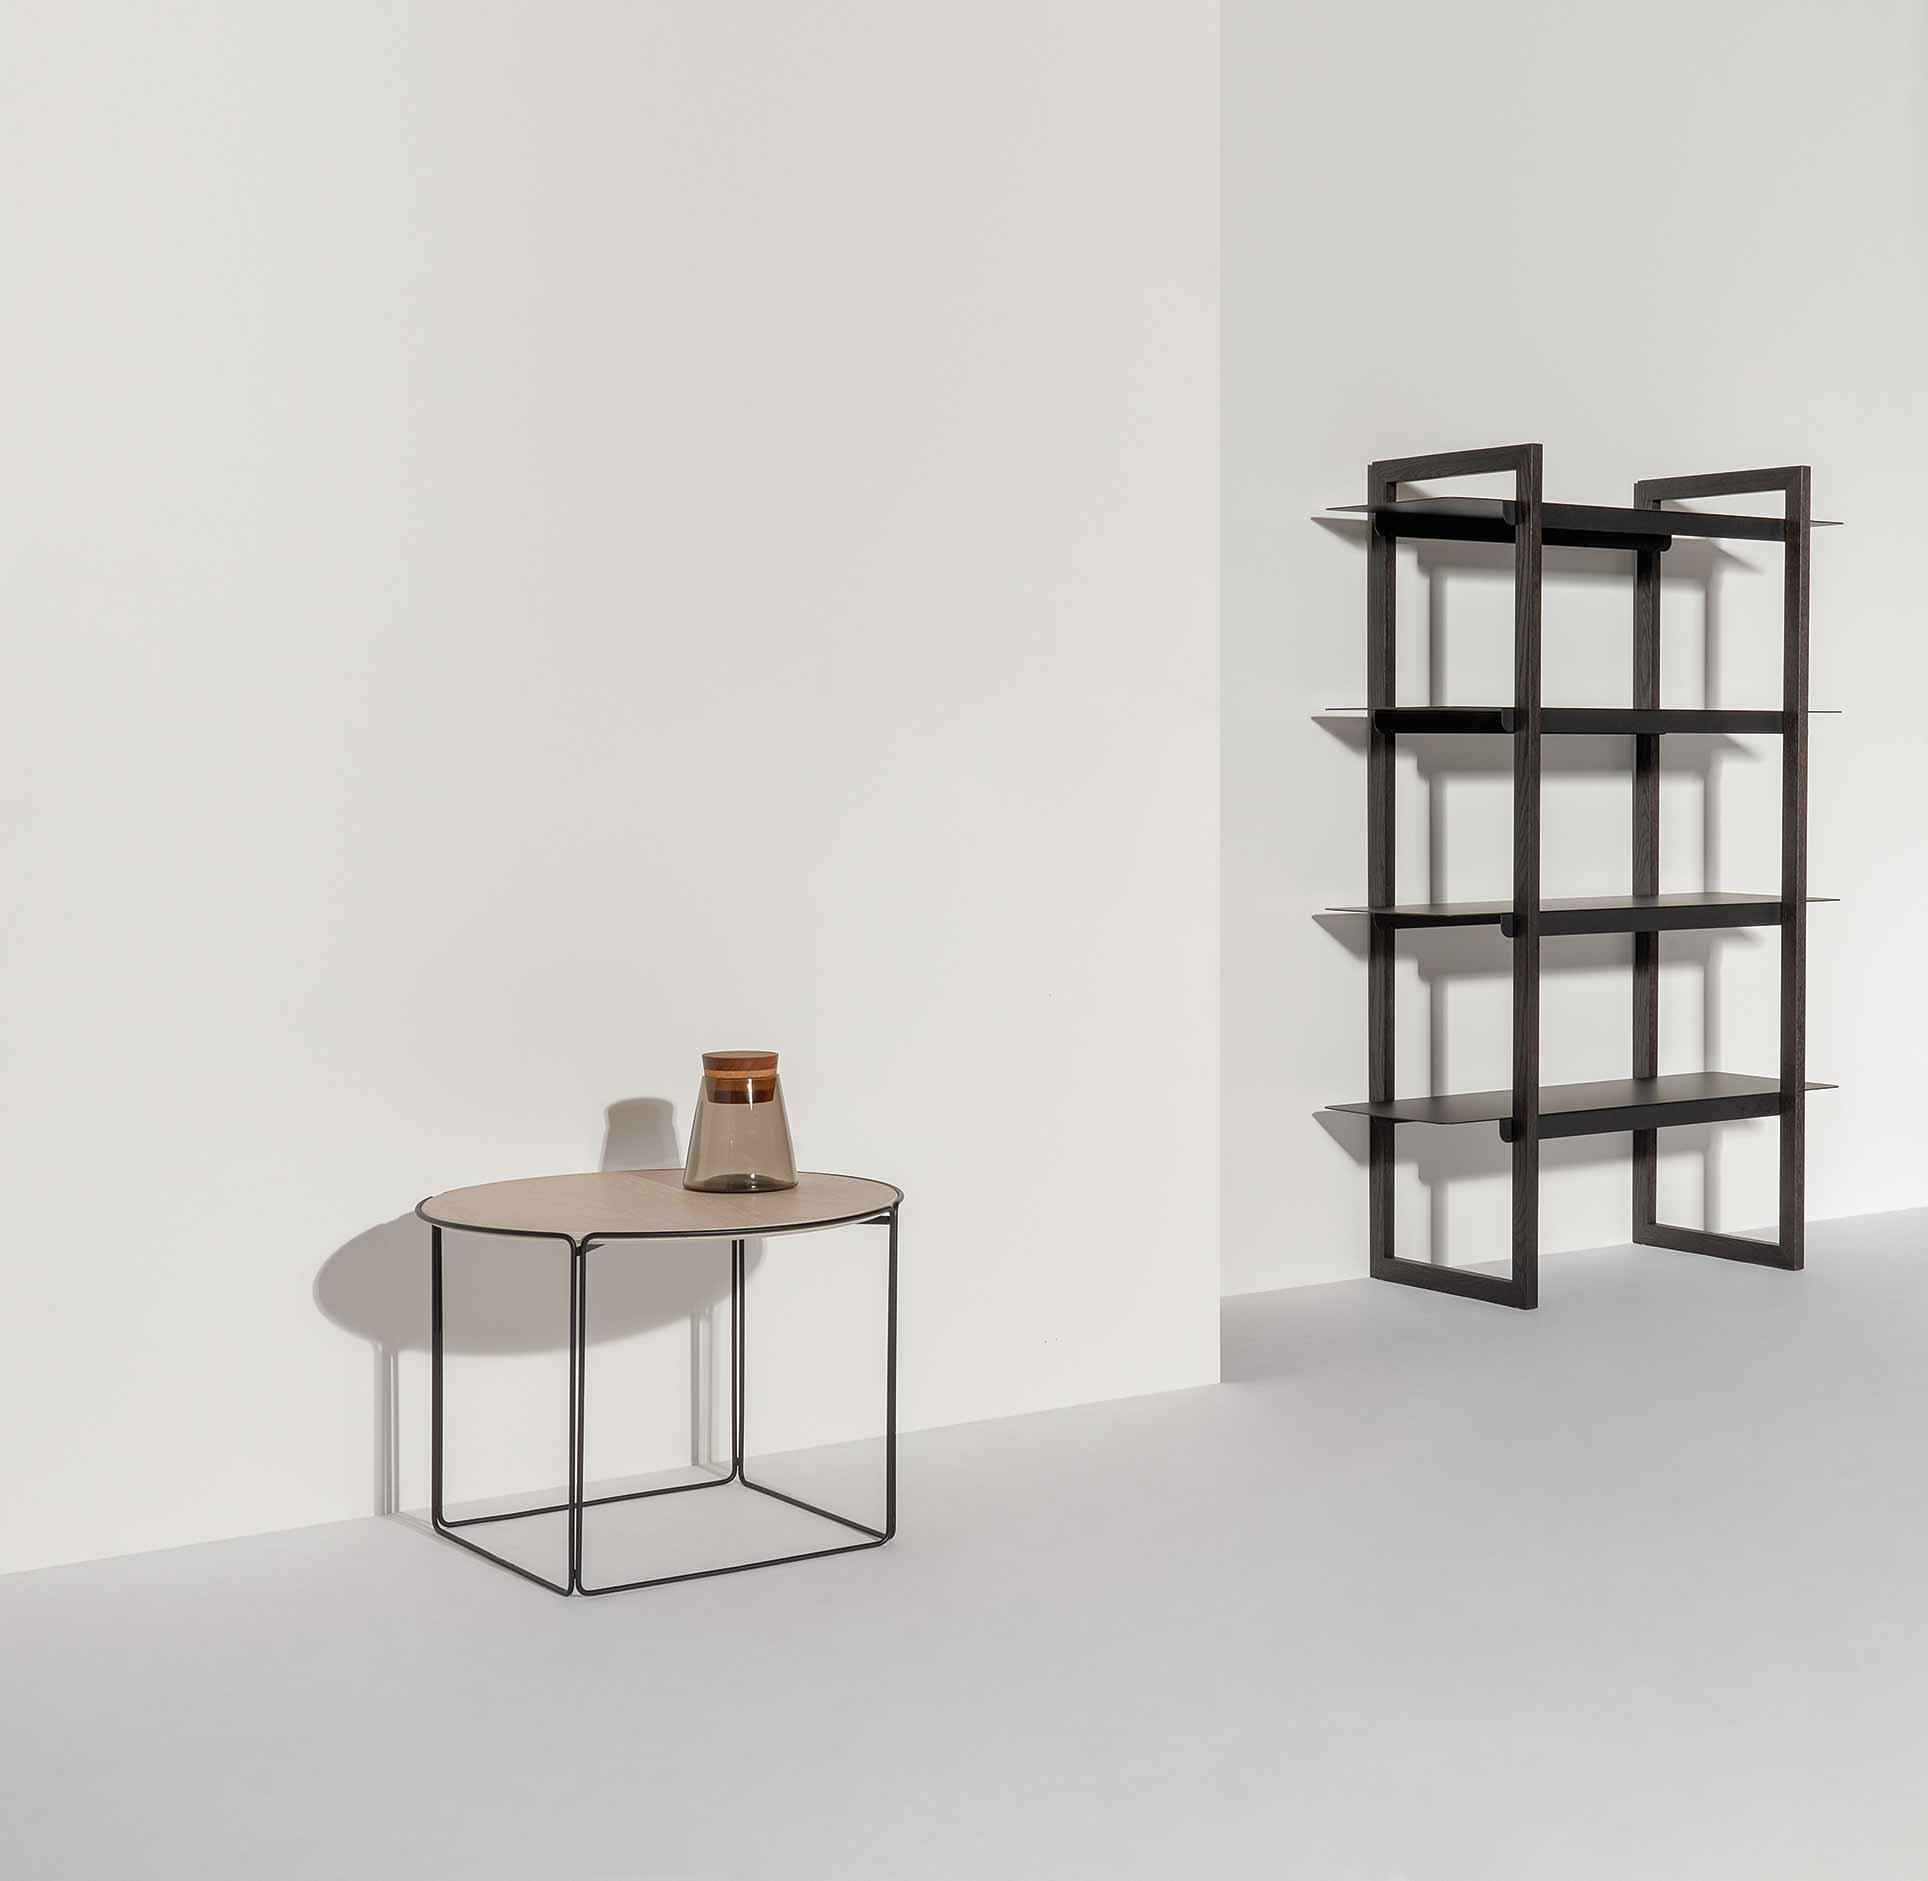 JamFactory_Furniture_4_Adam-Goodrum_Daniel-Ticker_Rhys-Cooper.jpg